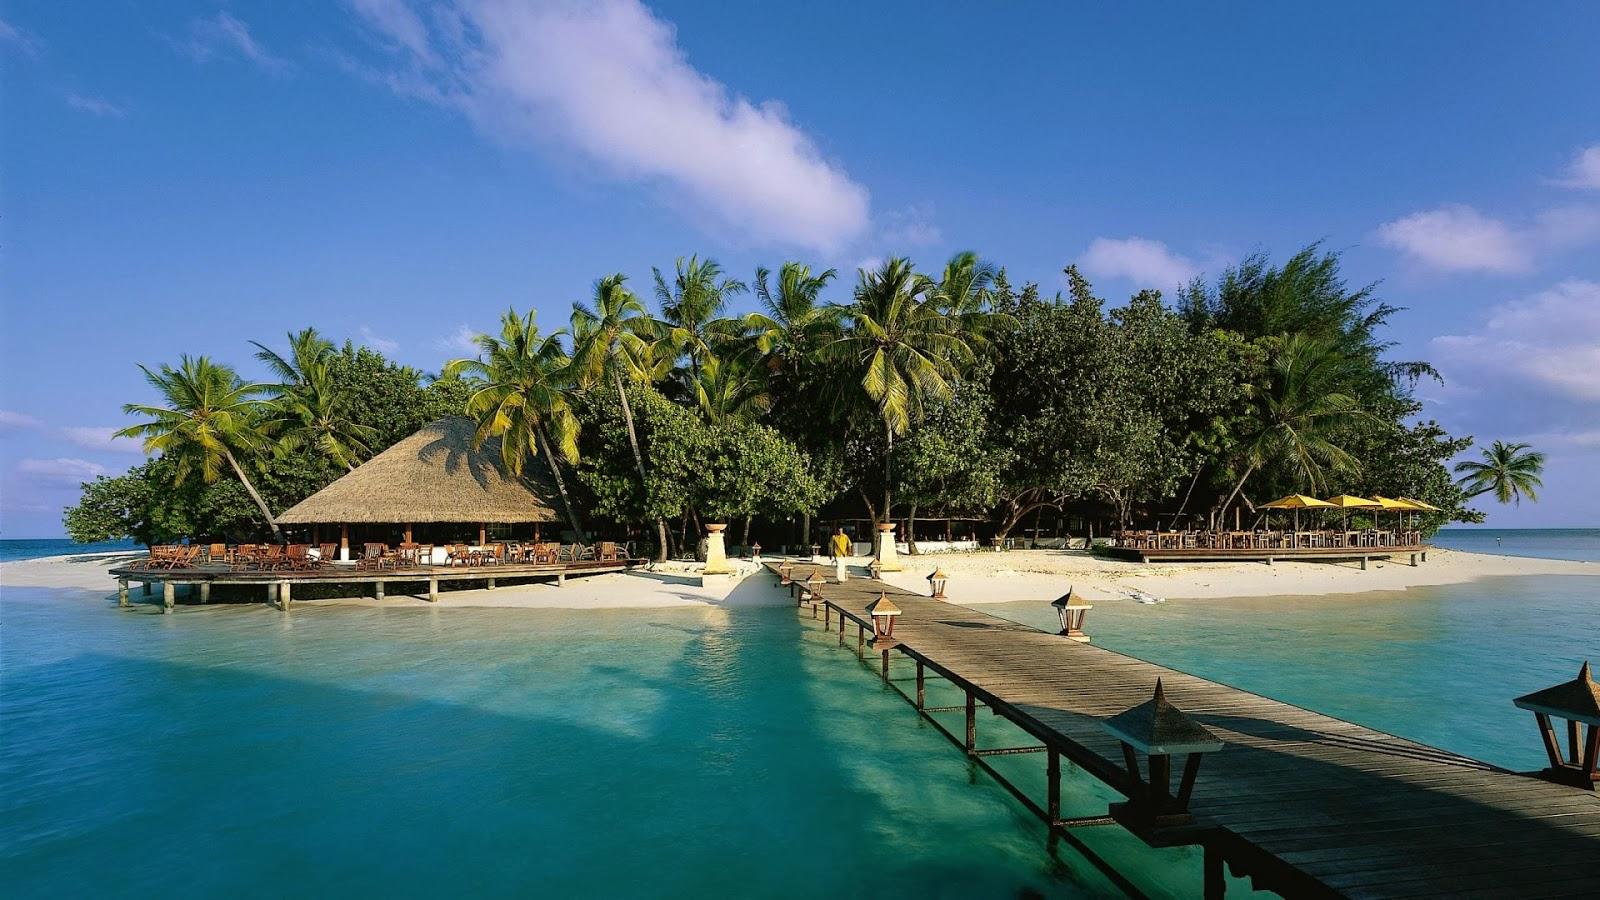 investimento em valor lua de mel ilhas maldivas. Black Bedroom Furniture Sets. Home Design Ideas